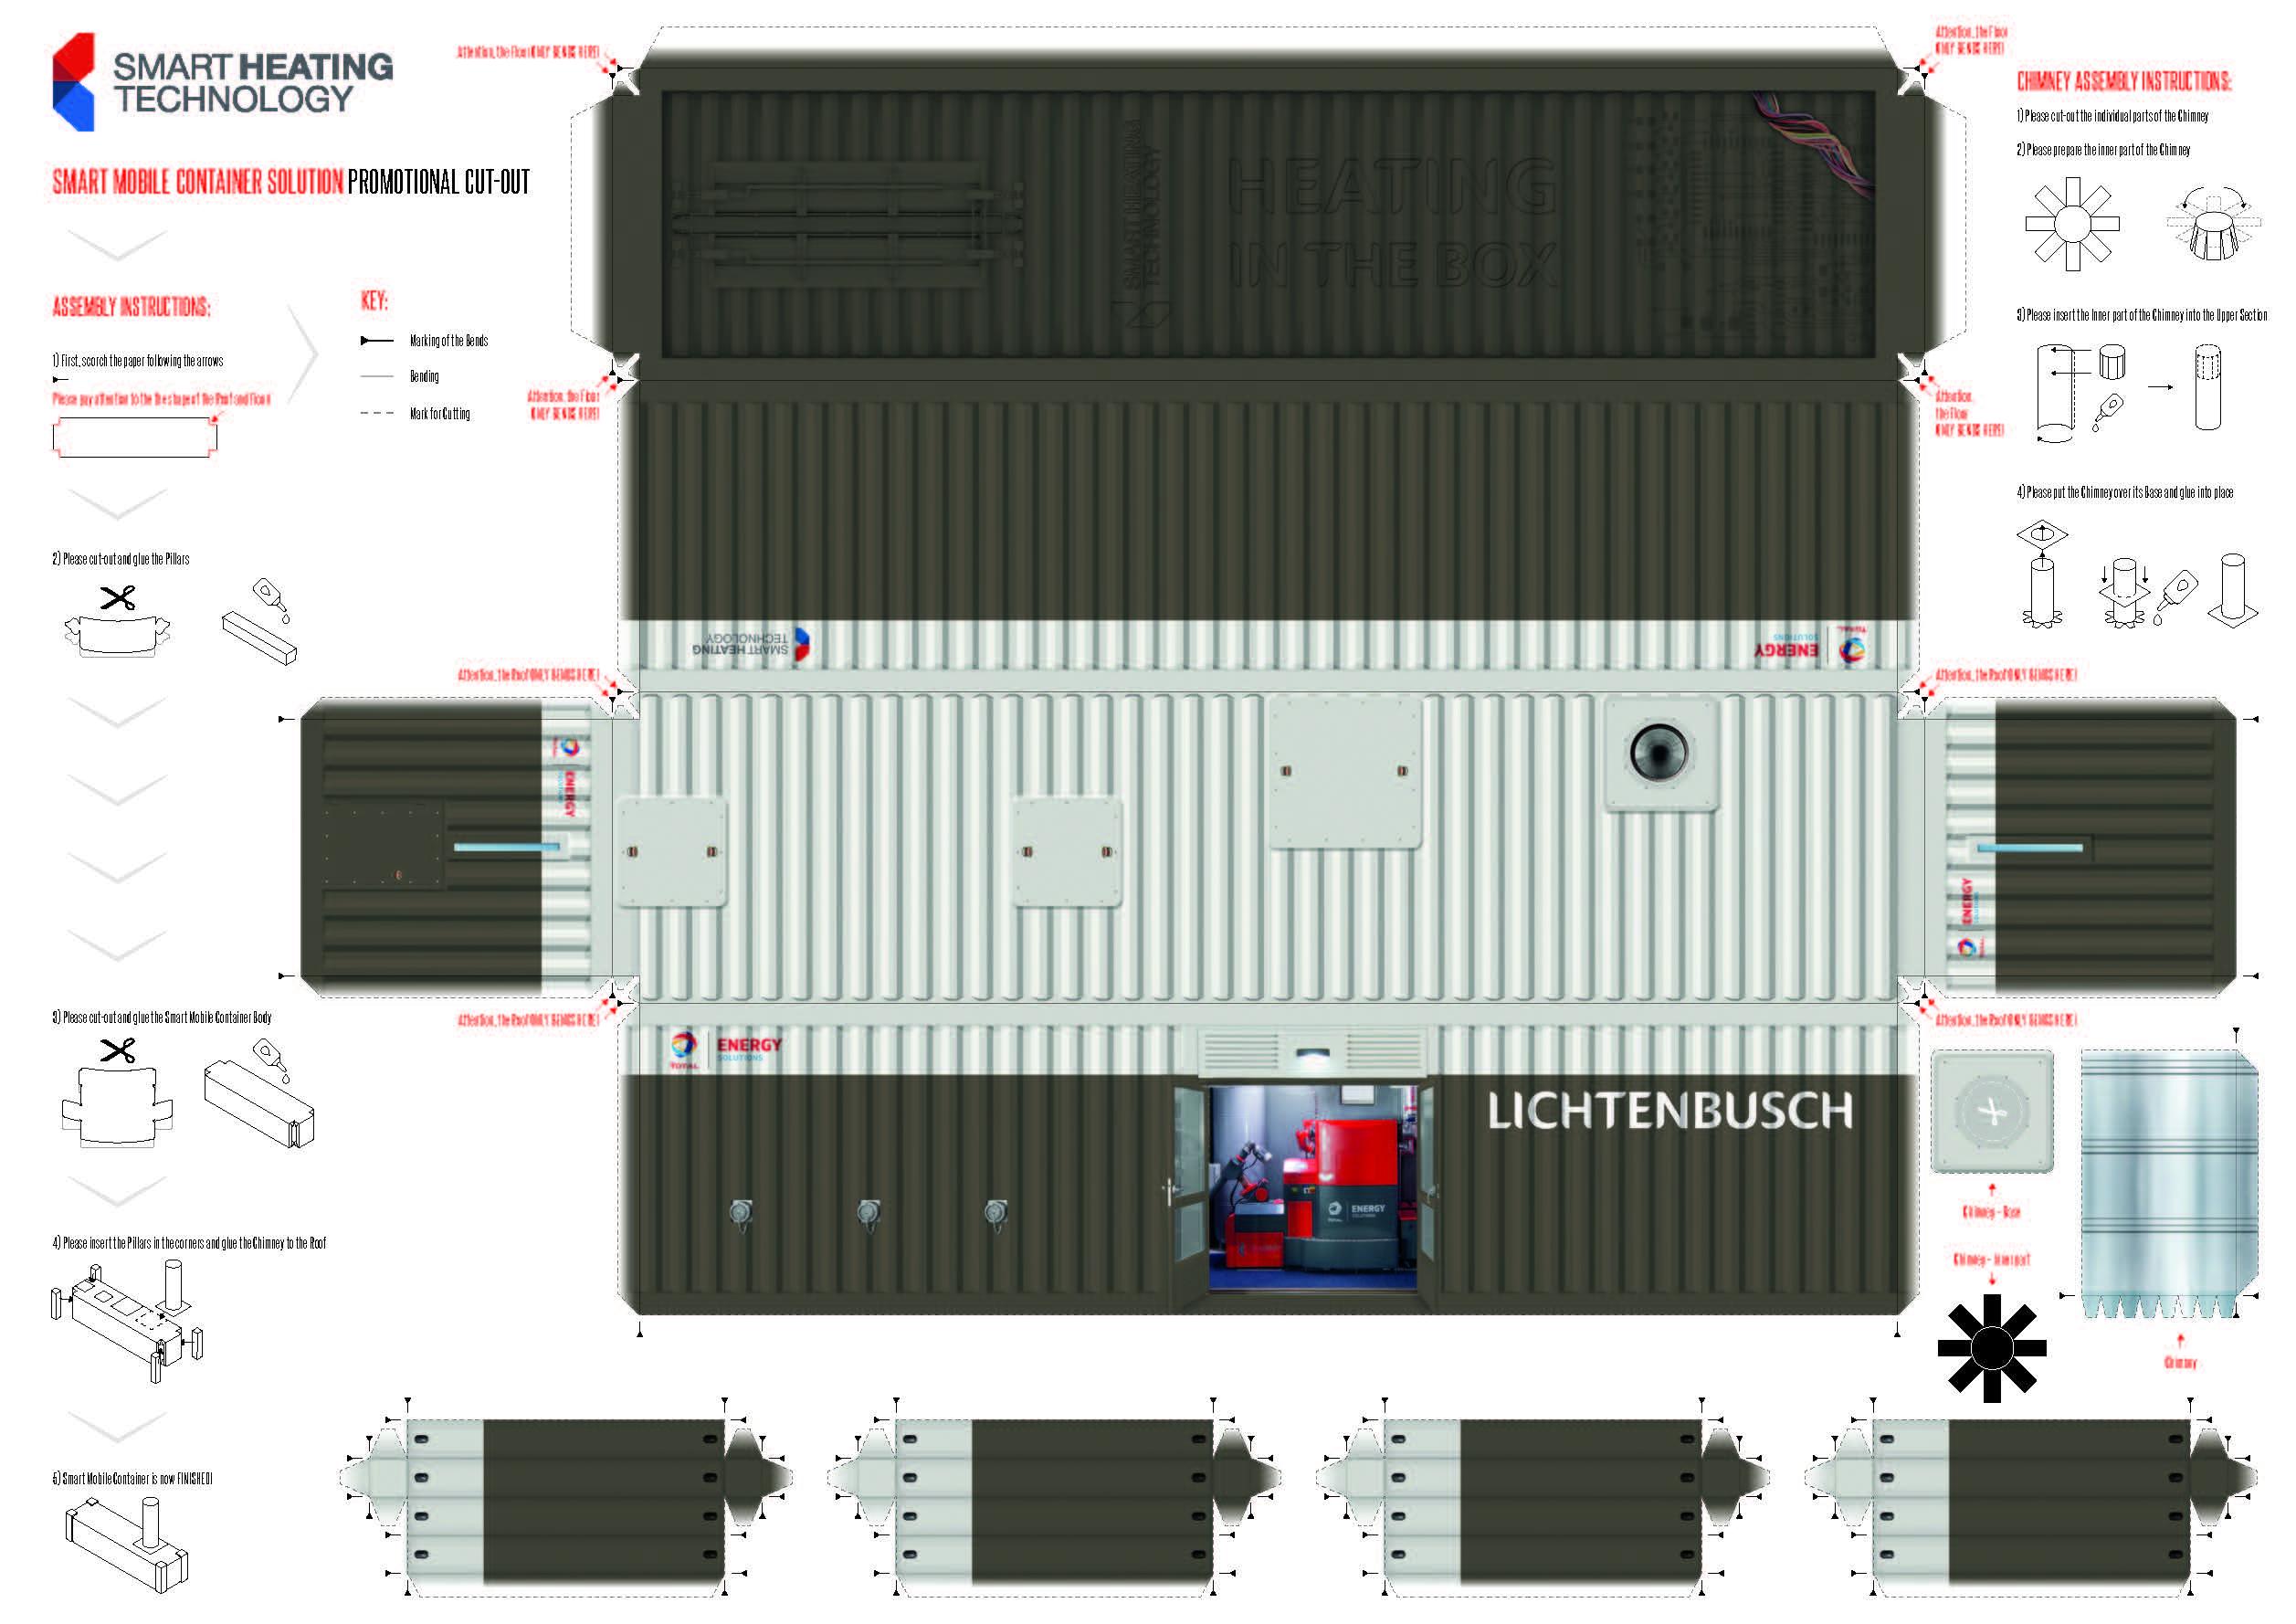 kontejner_vystrihovanka_total_nahled